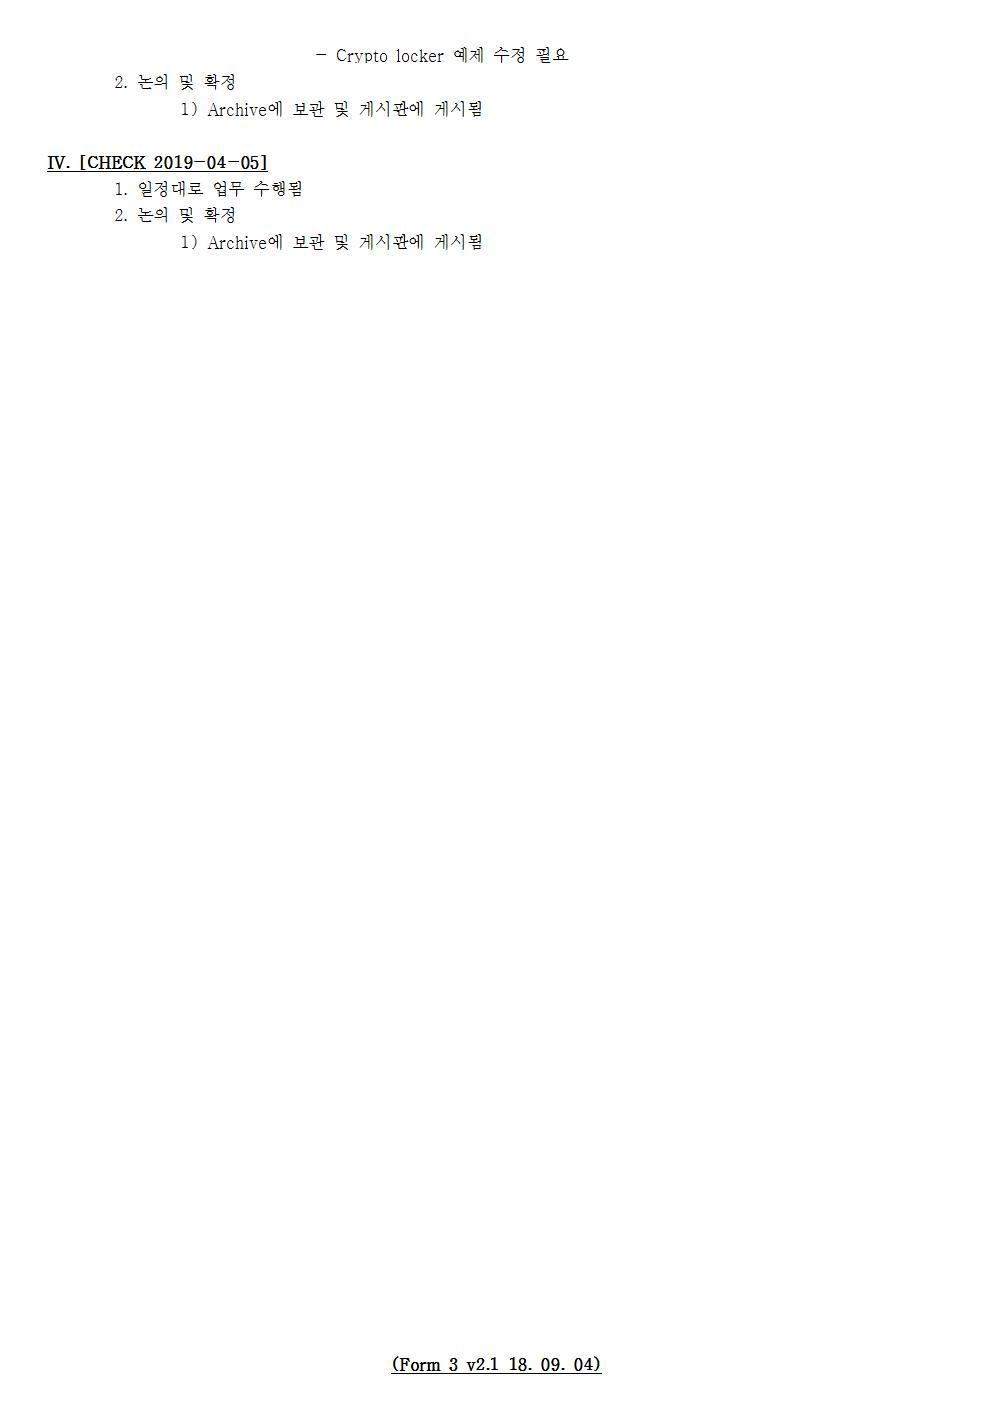 D-[19-001-RD-01]-[SAVE 3.X]-[2019-04-05][SH]002.jpg